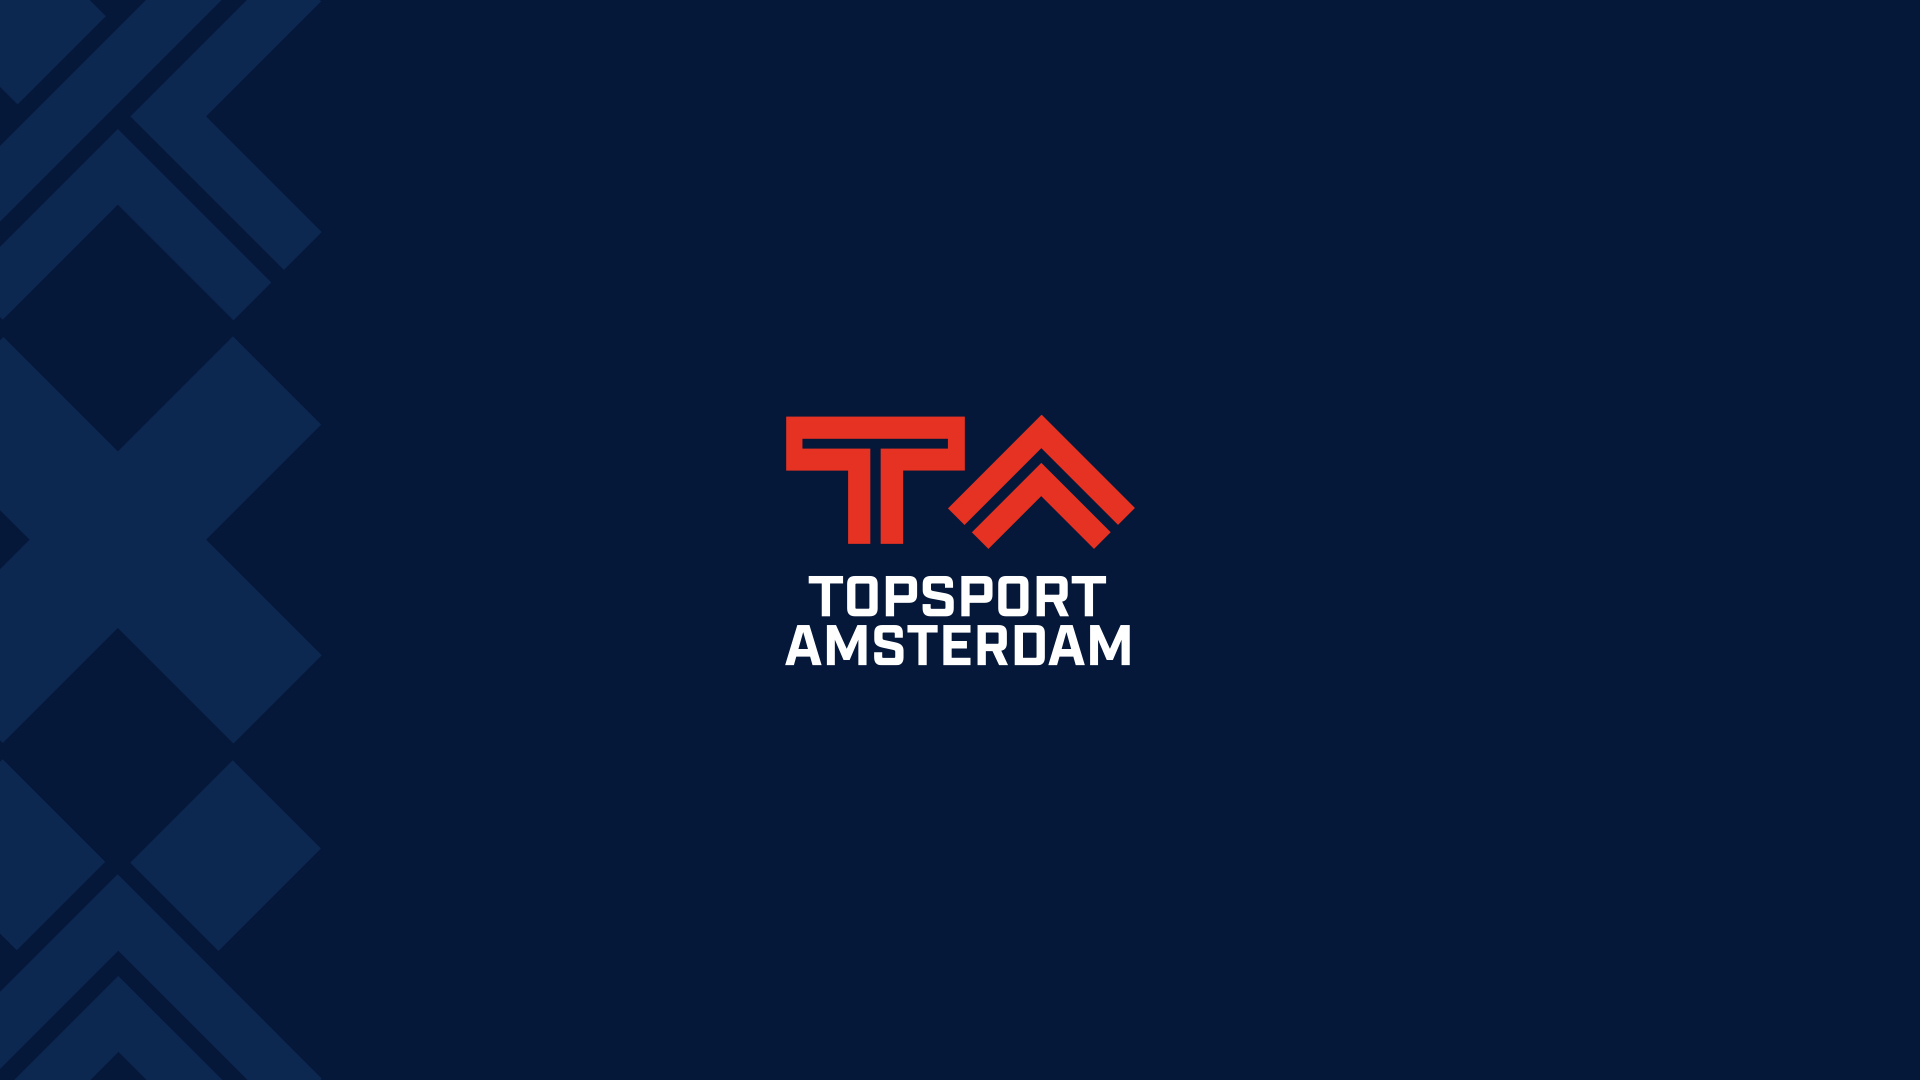 Topsport Amsterdam Logo